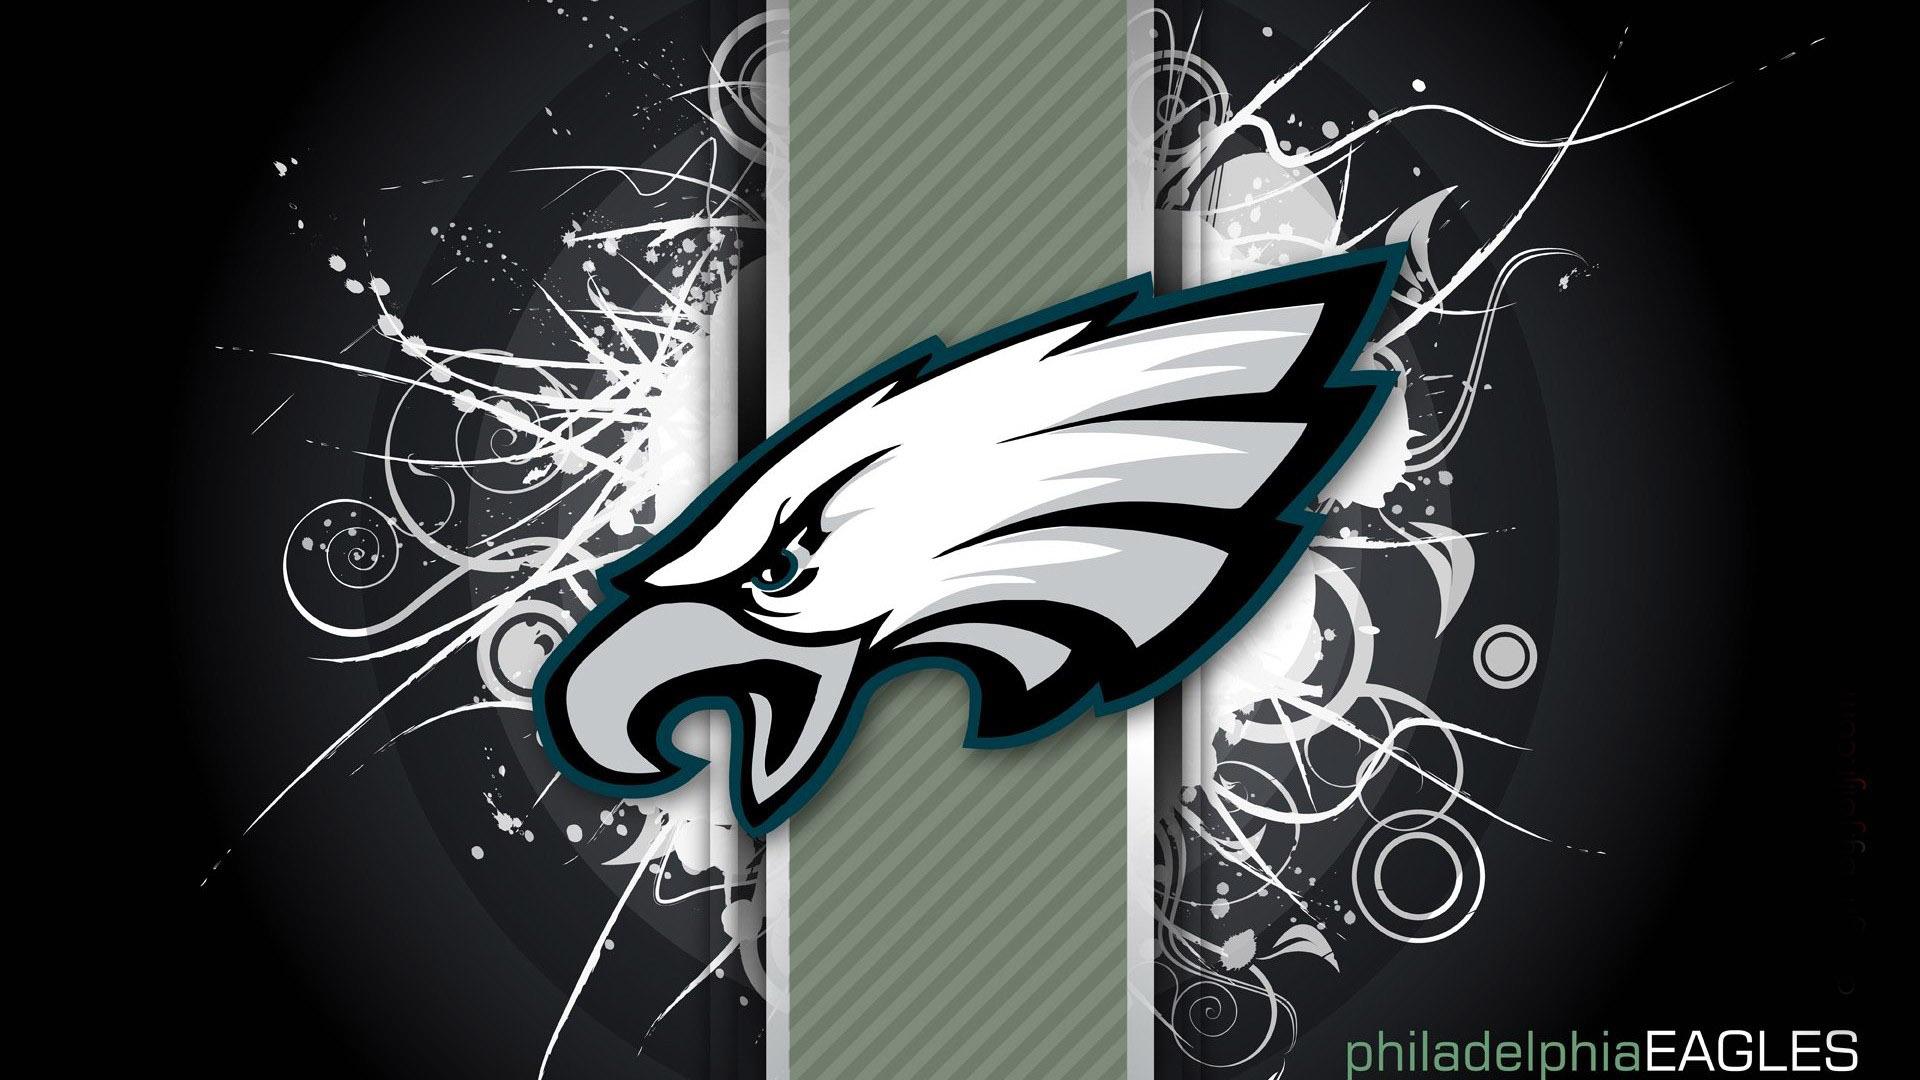 Philadelphia Eagles High Quality Wallpapers